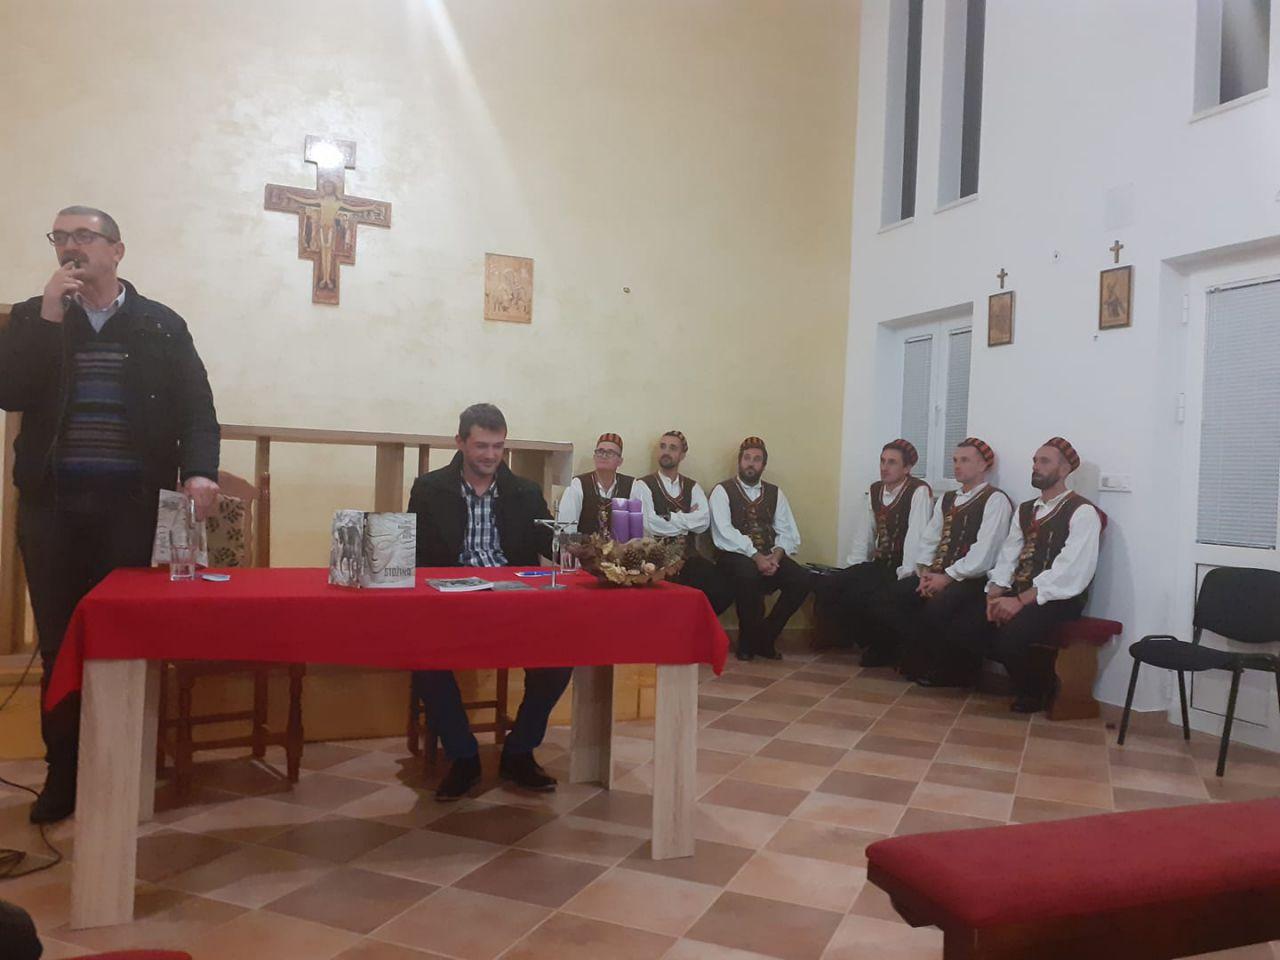 Ante Nadomir Tadić Šutra predstavio je svoju 11. knjigu